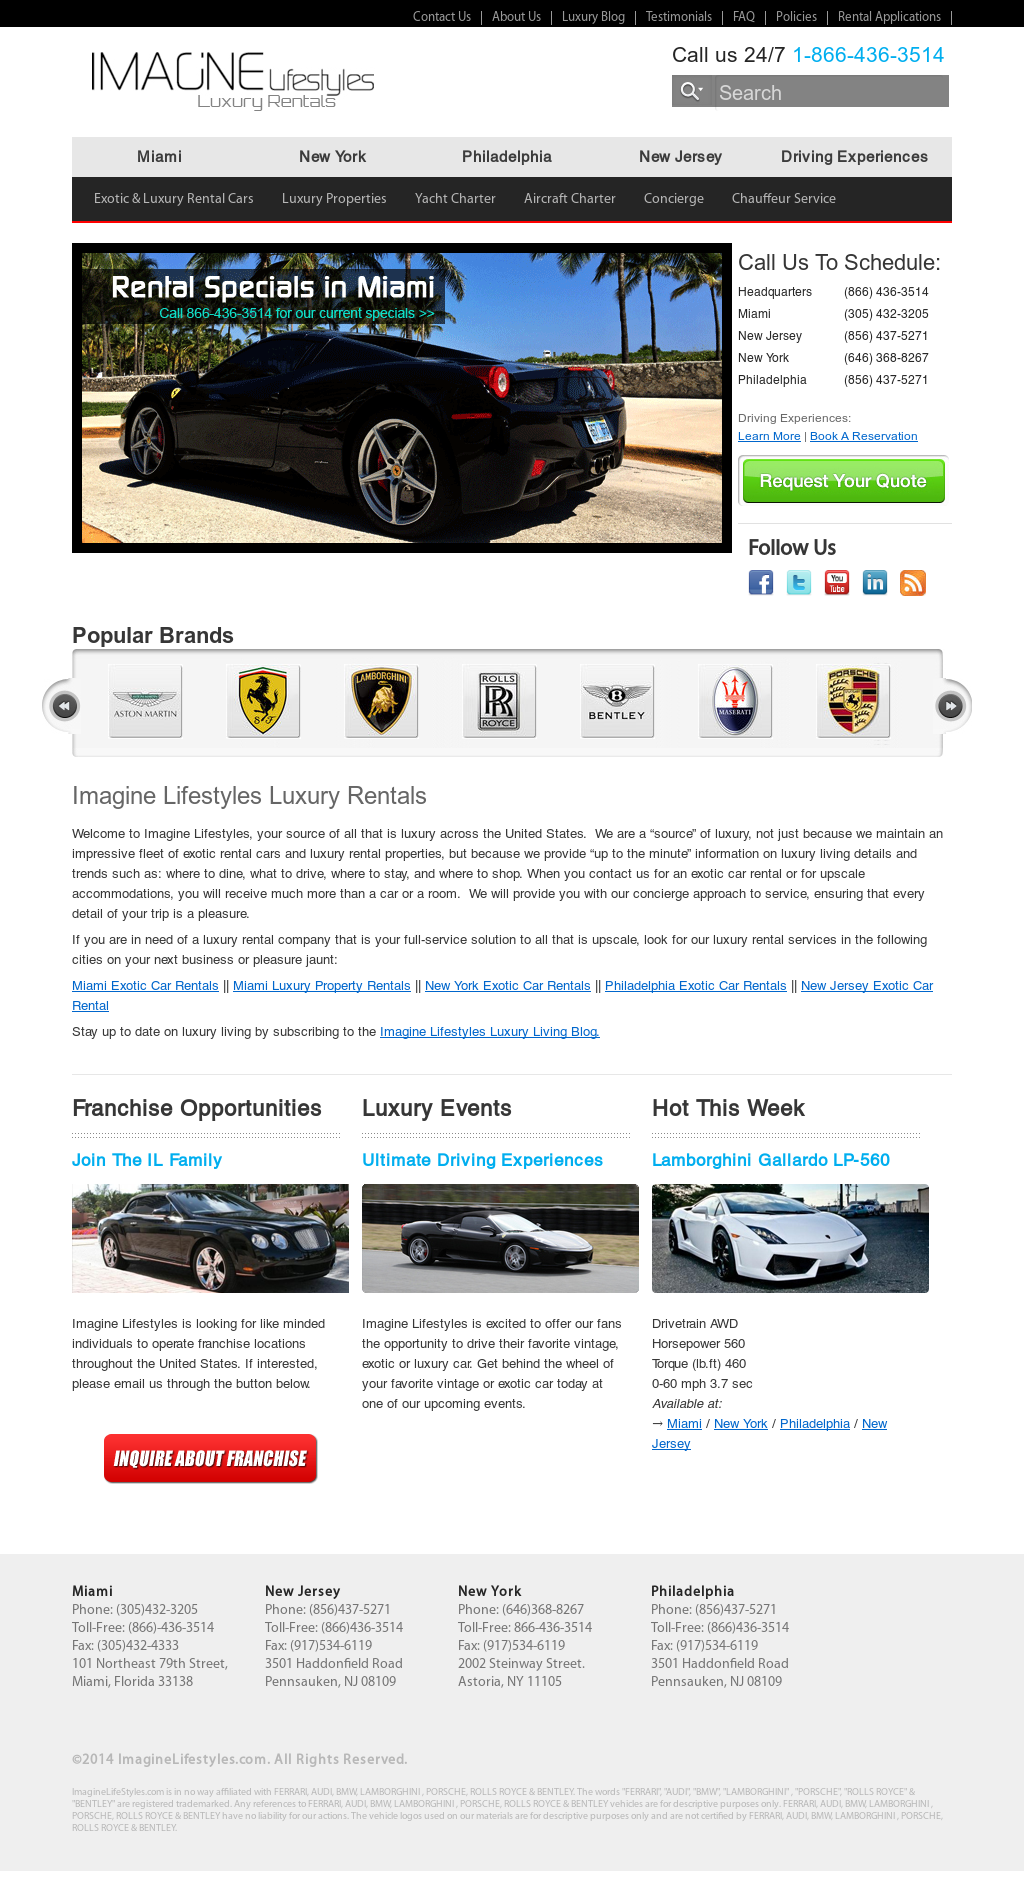 bentley car rental dealer about us platinum motorcars premium in philadelphia luxury exotic your and